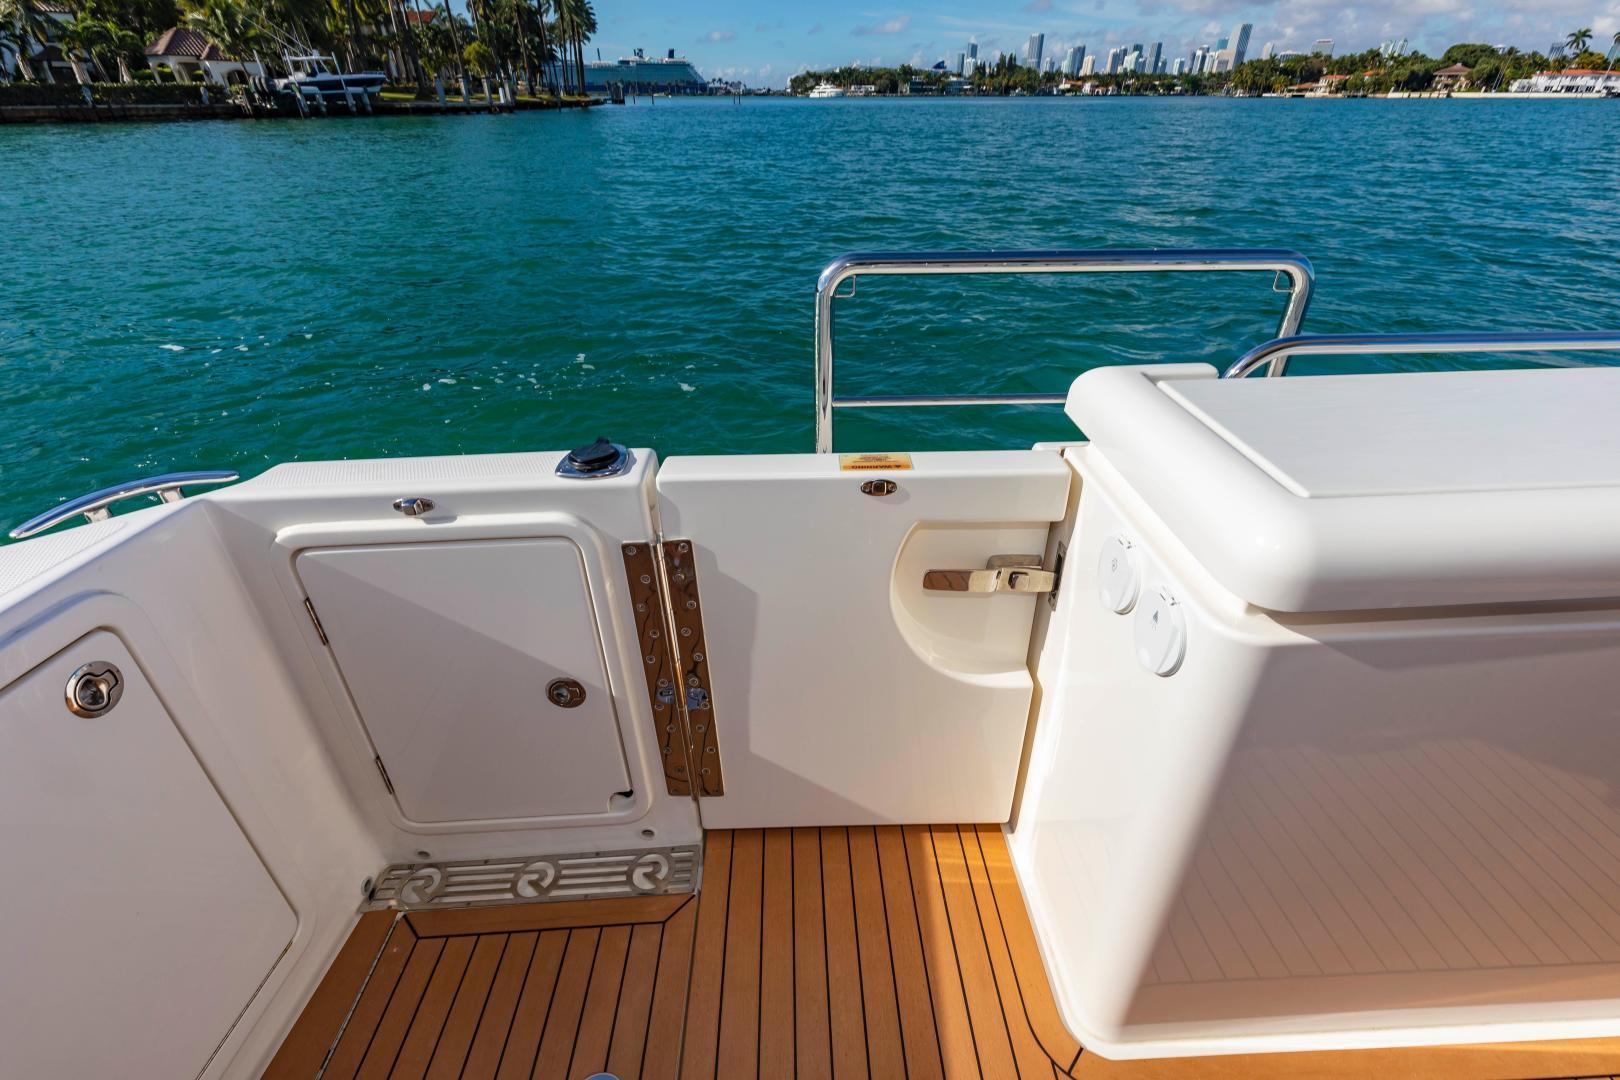 Riviera-395 SUV 2019-Ipanema Miami Beach-Florida-United States-1614892   Thumbnail